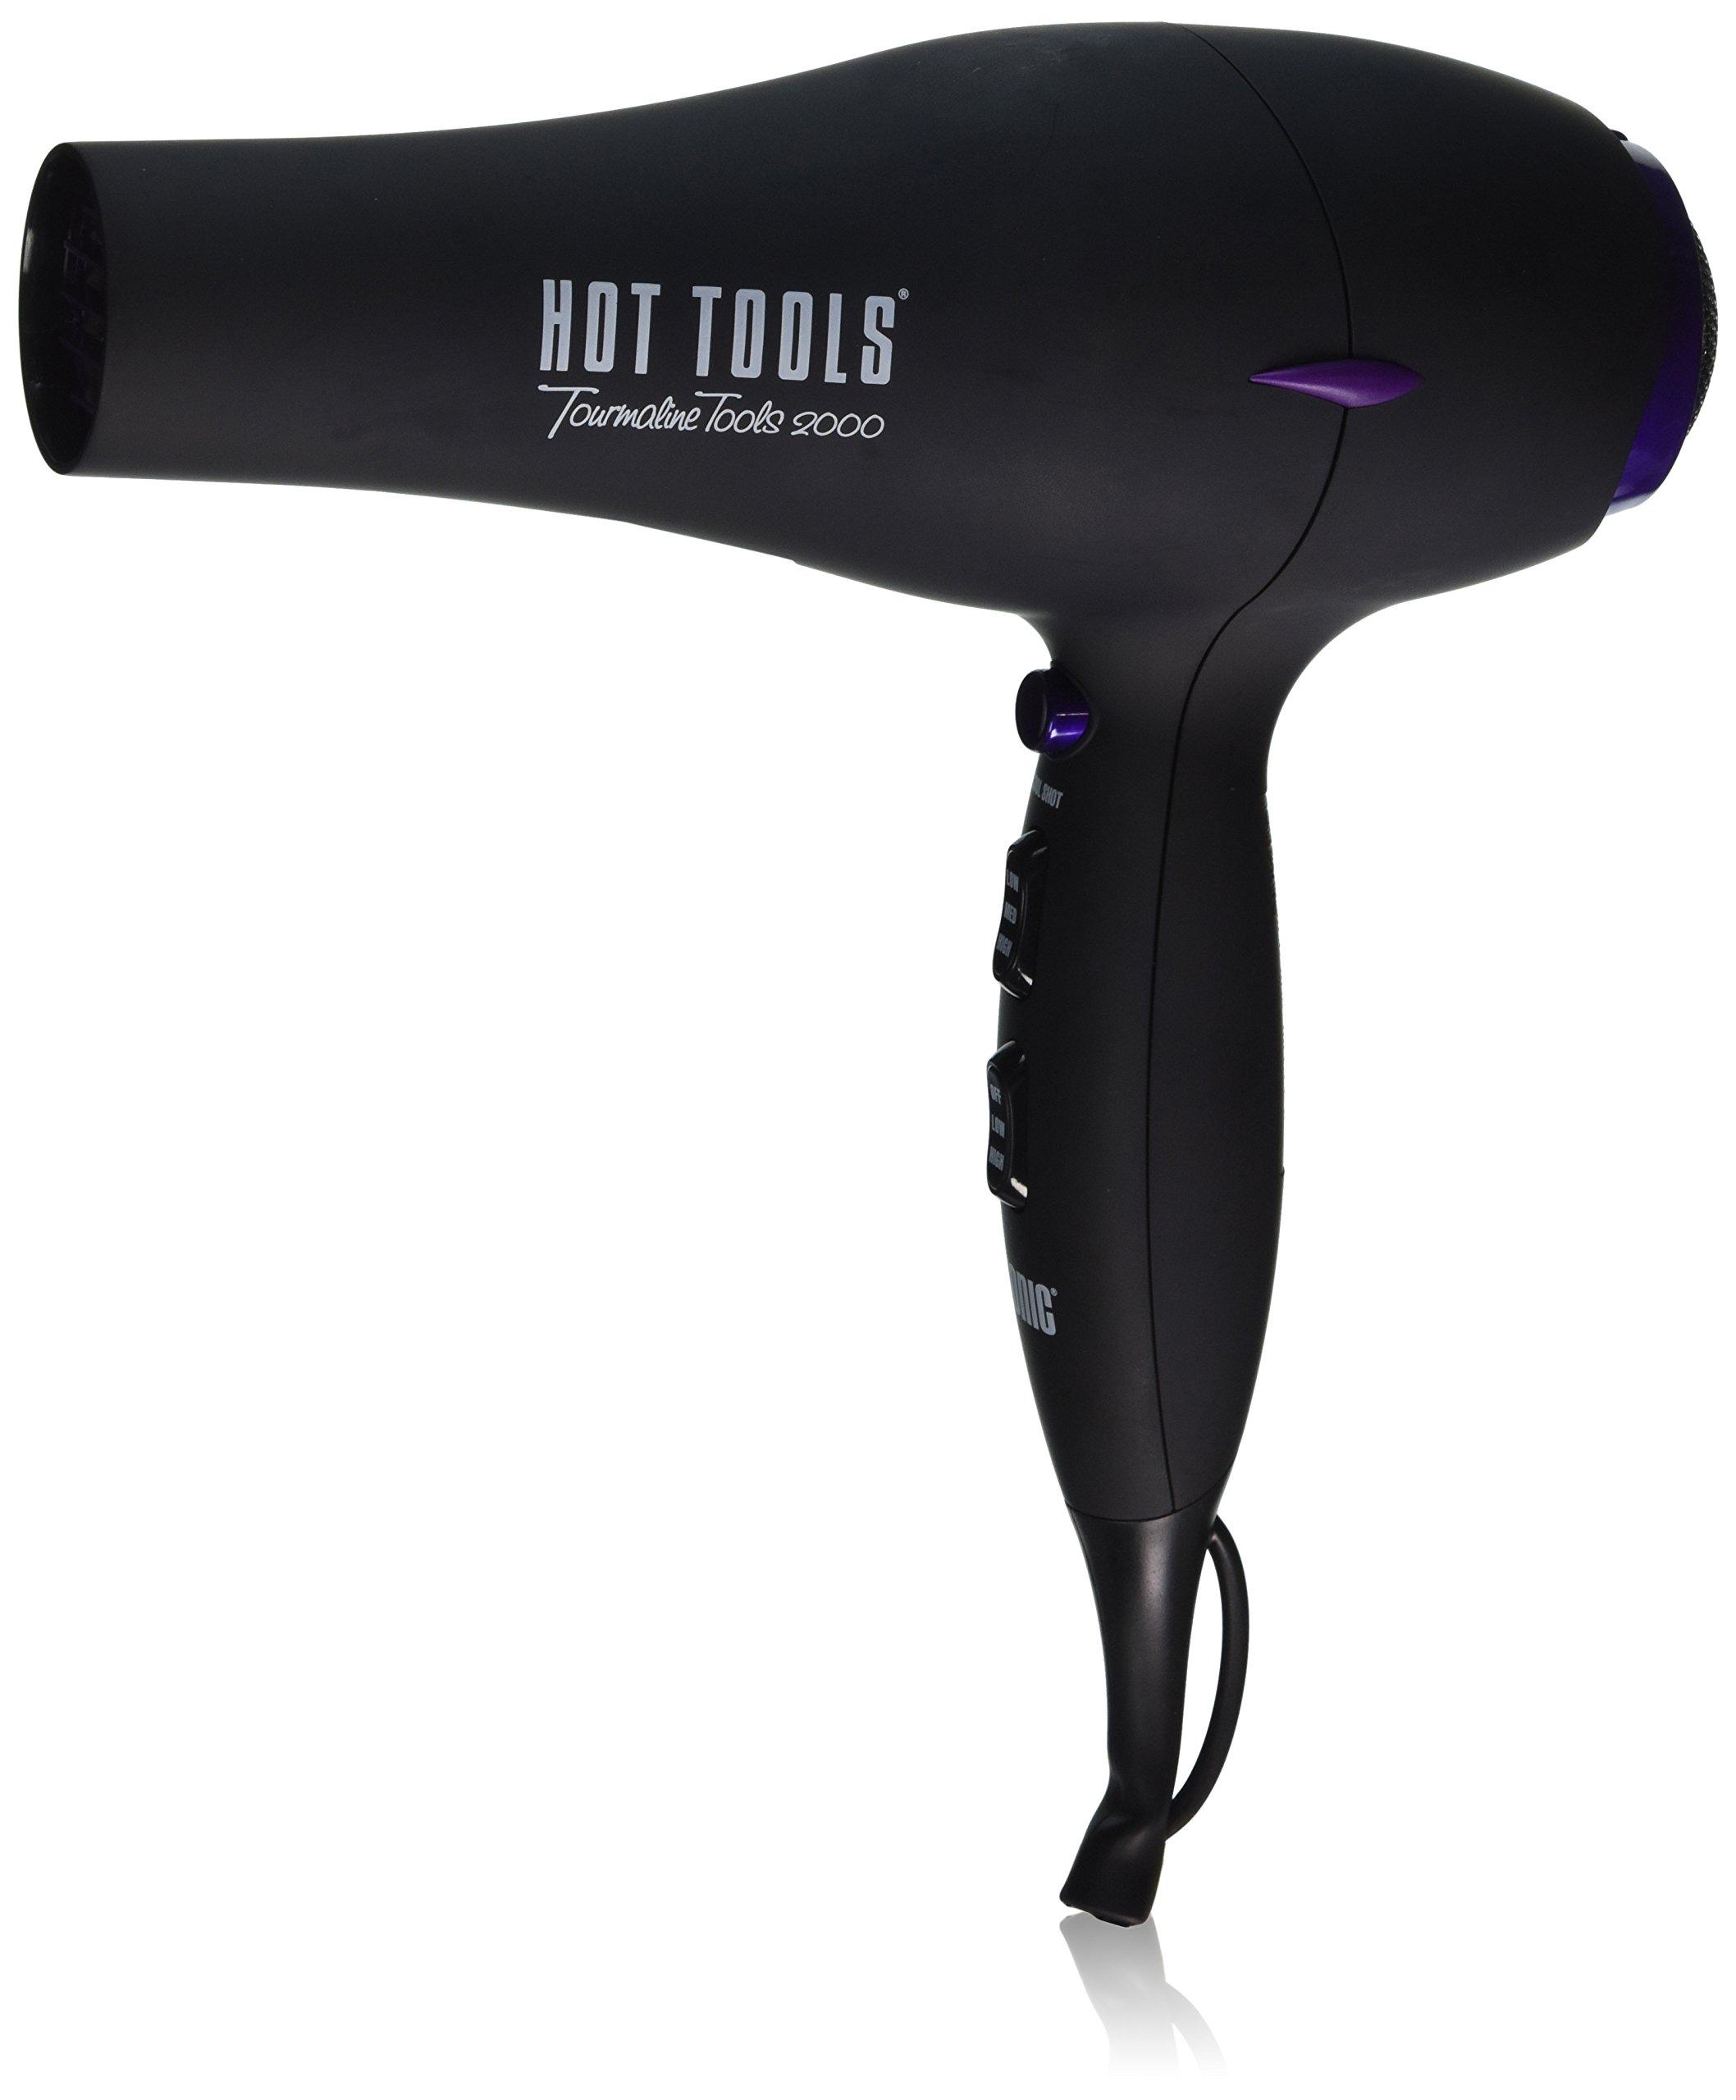 Hot Tools Tourmaline Tools 2000 Turbo Ionic Dryer